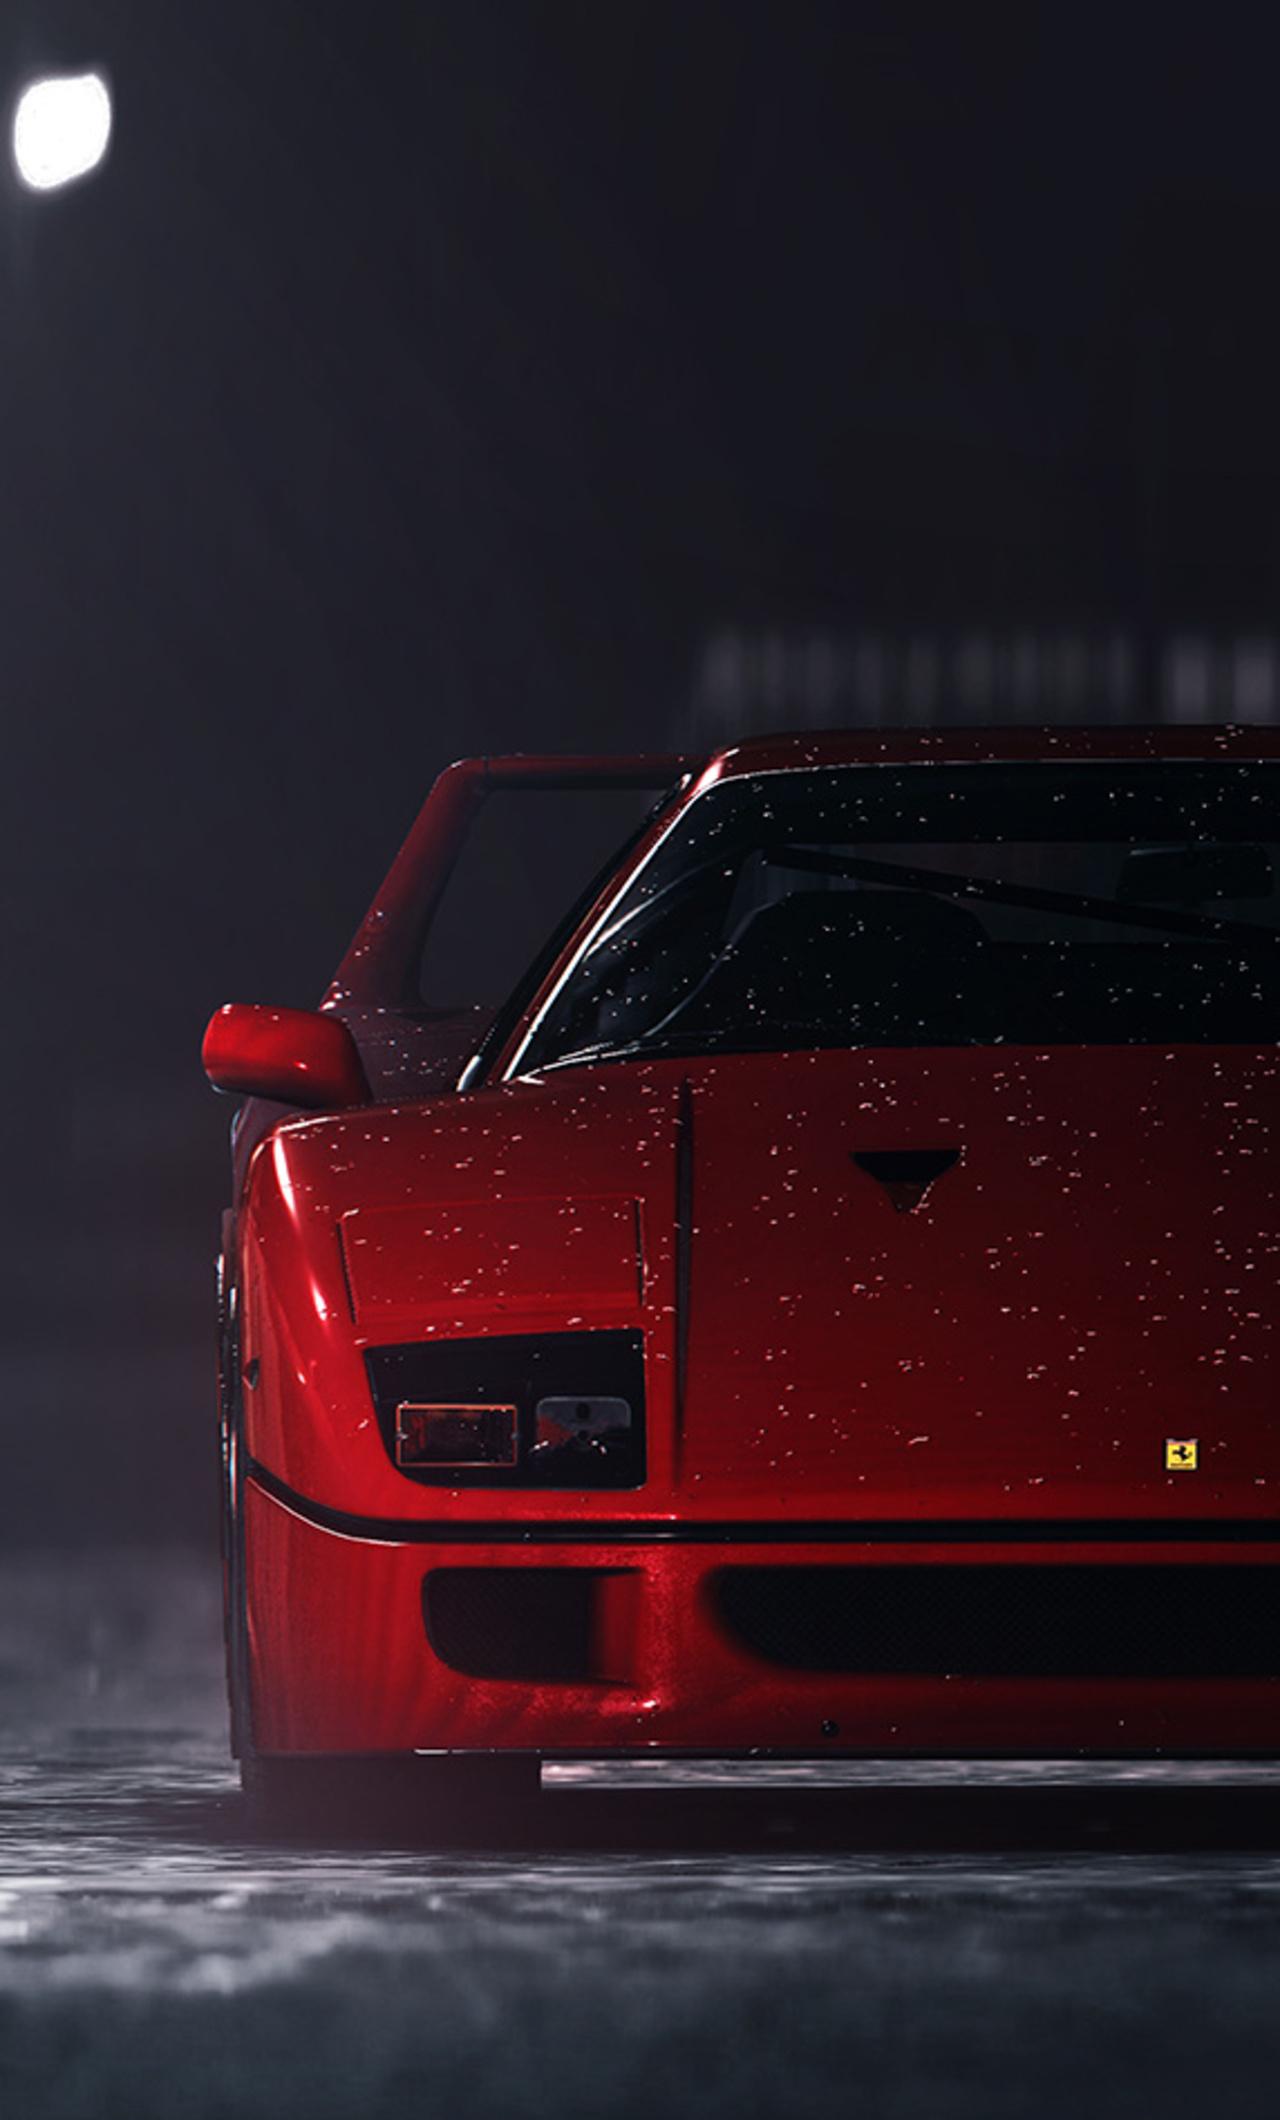 1280x2120 Ferrari F40 In Need For Speed iPhone 6+ HD 4k